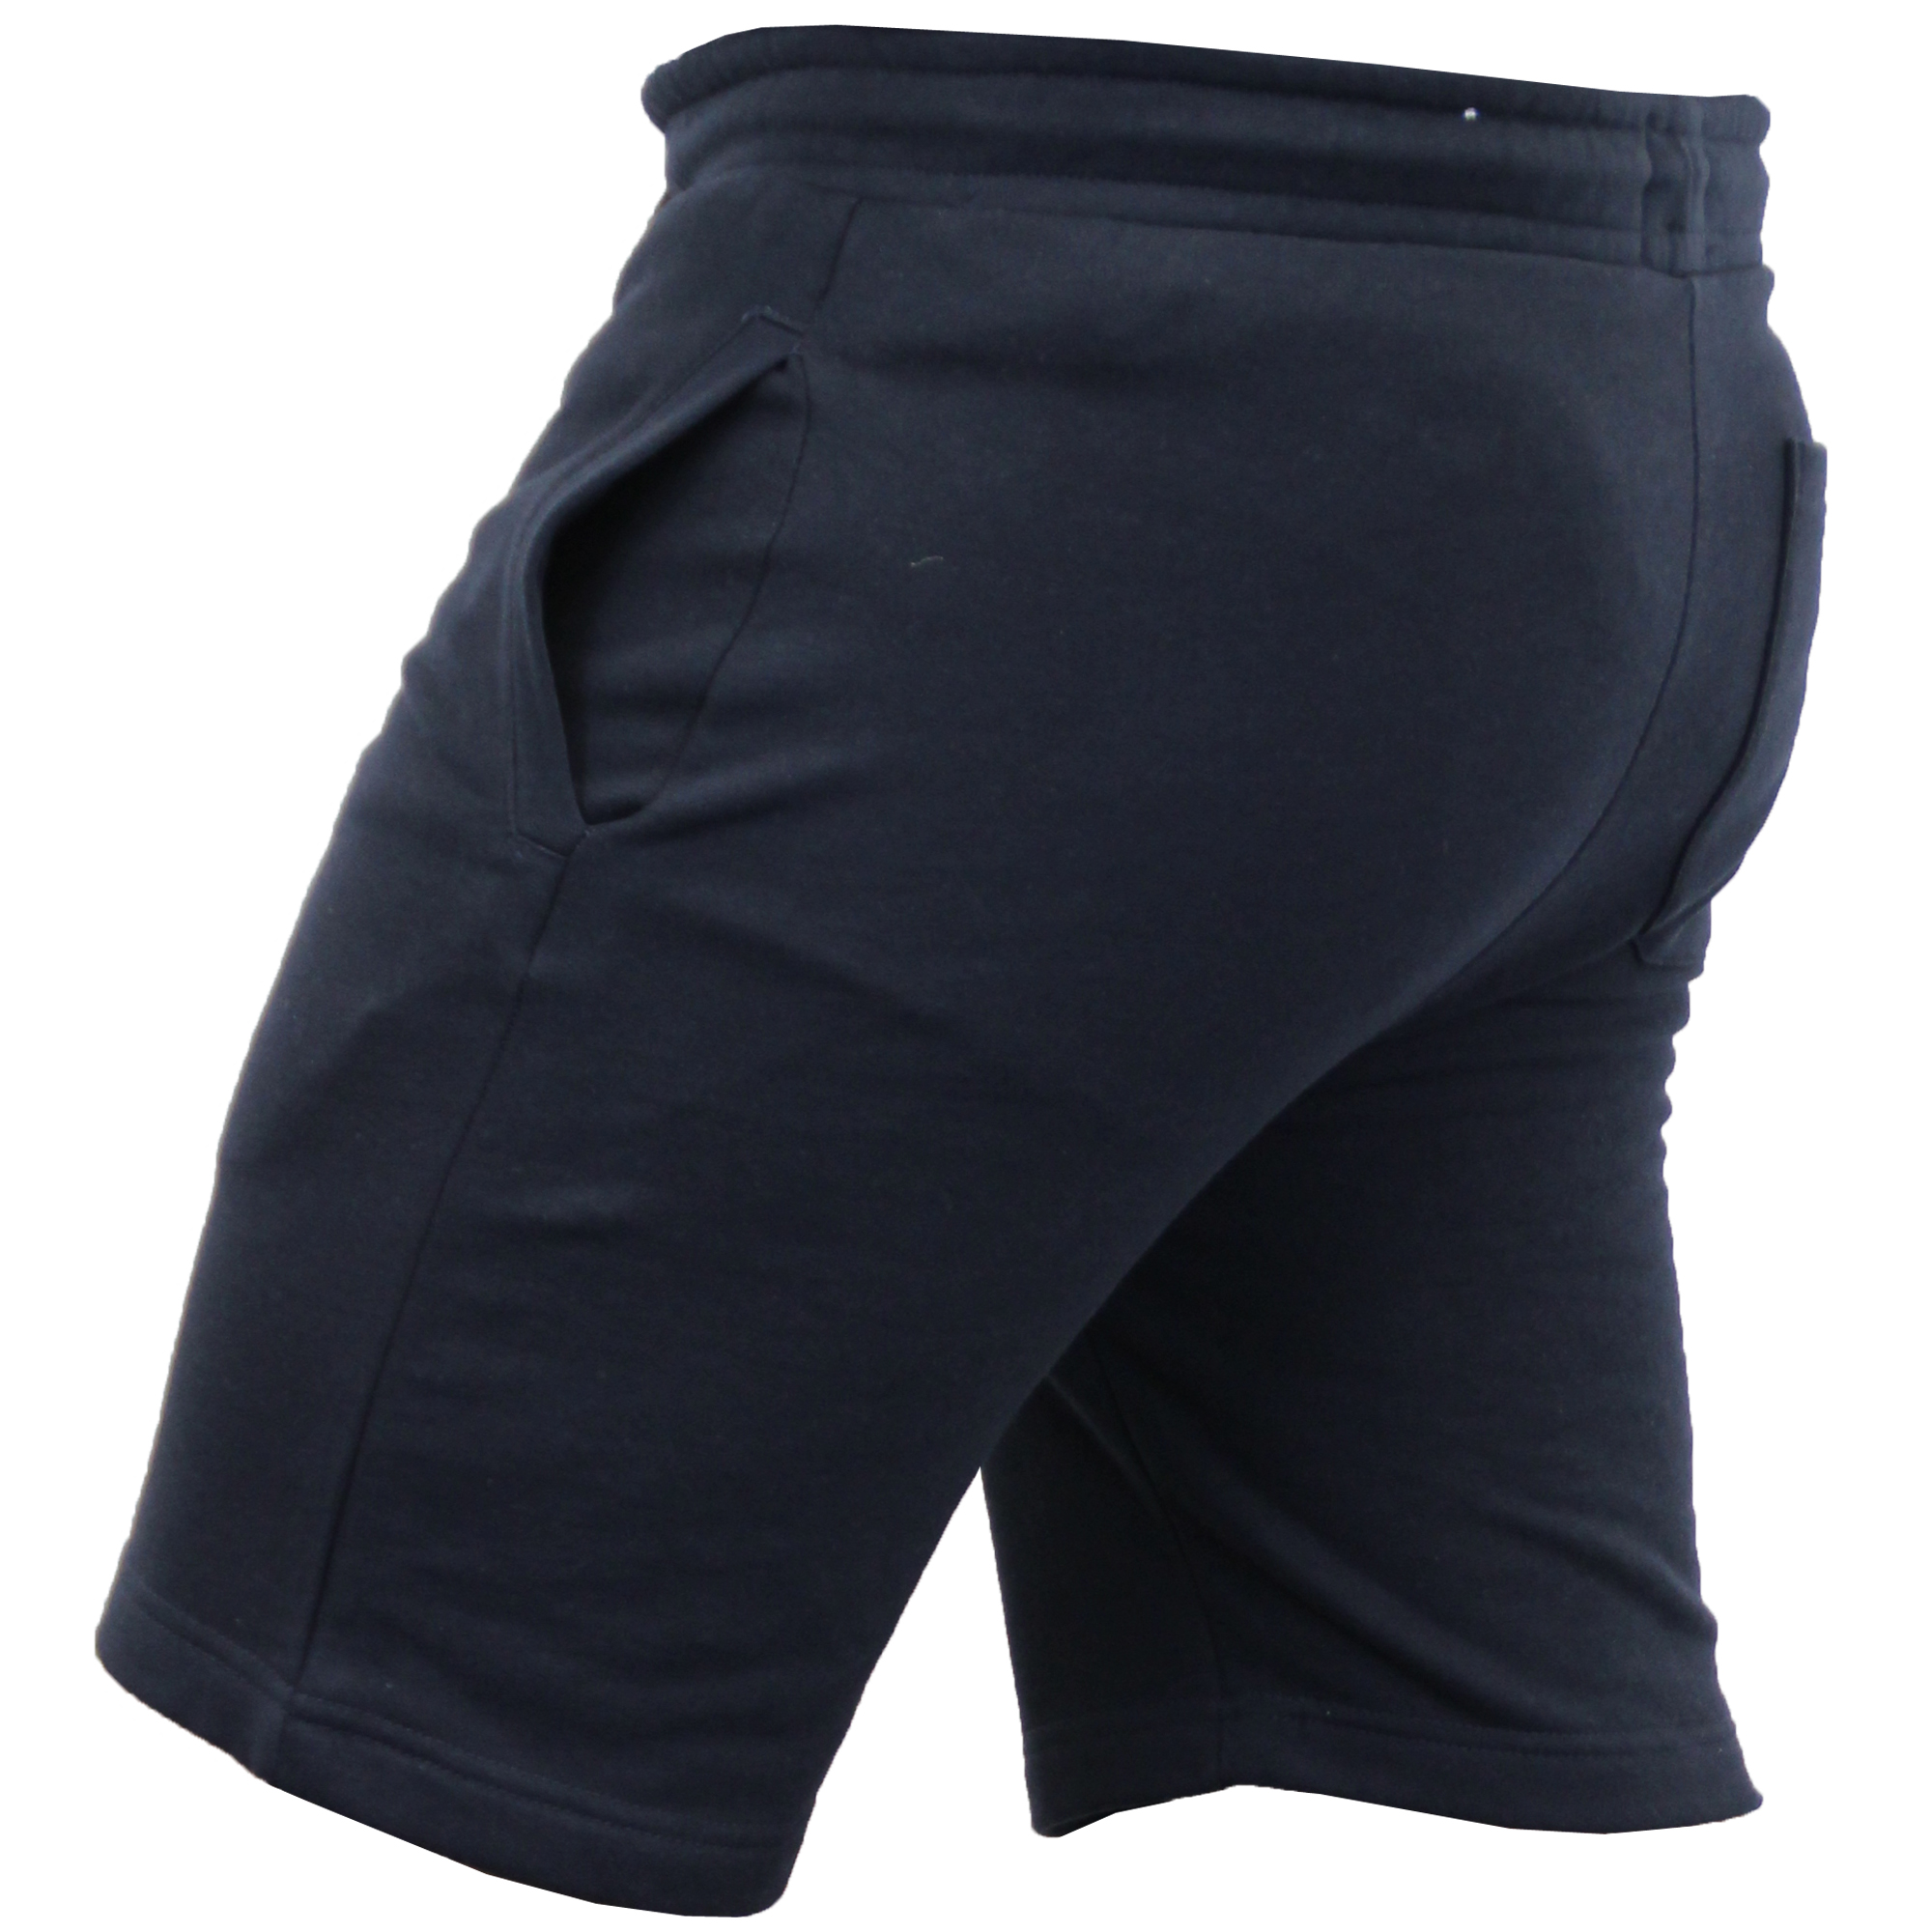 Mens-Jogger-Shorts-Tarley-by-Brave-Soul-Knee-Length-Casual-Fleece-Lined-Summer thumbnail 27